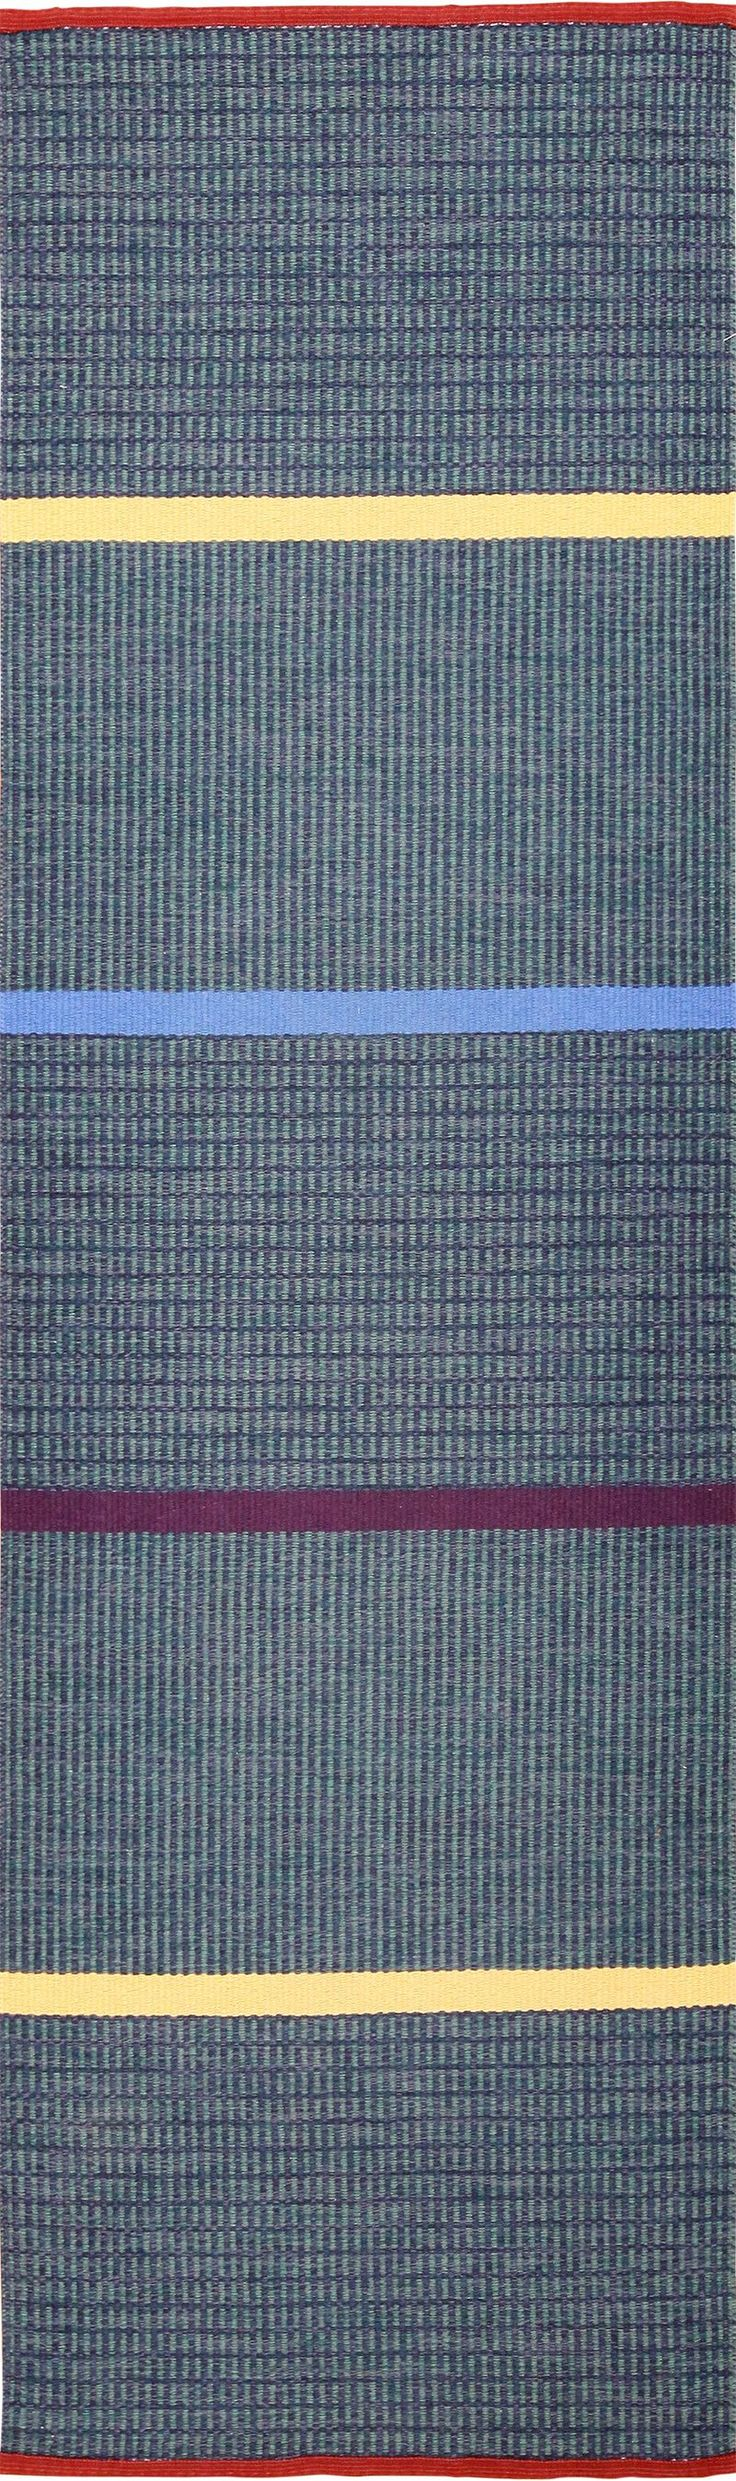 View this breathtaking ultra modern chic Gunilla Lagerhem Ullberg Scandinavian runner rug #49439 at Nazmiyal Antique Rugs in NYC.